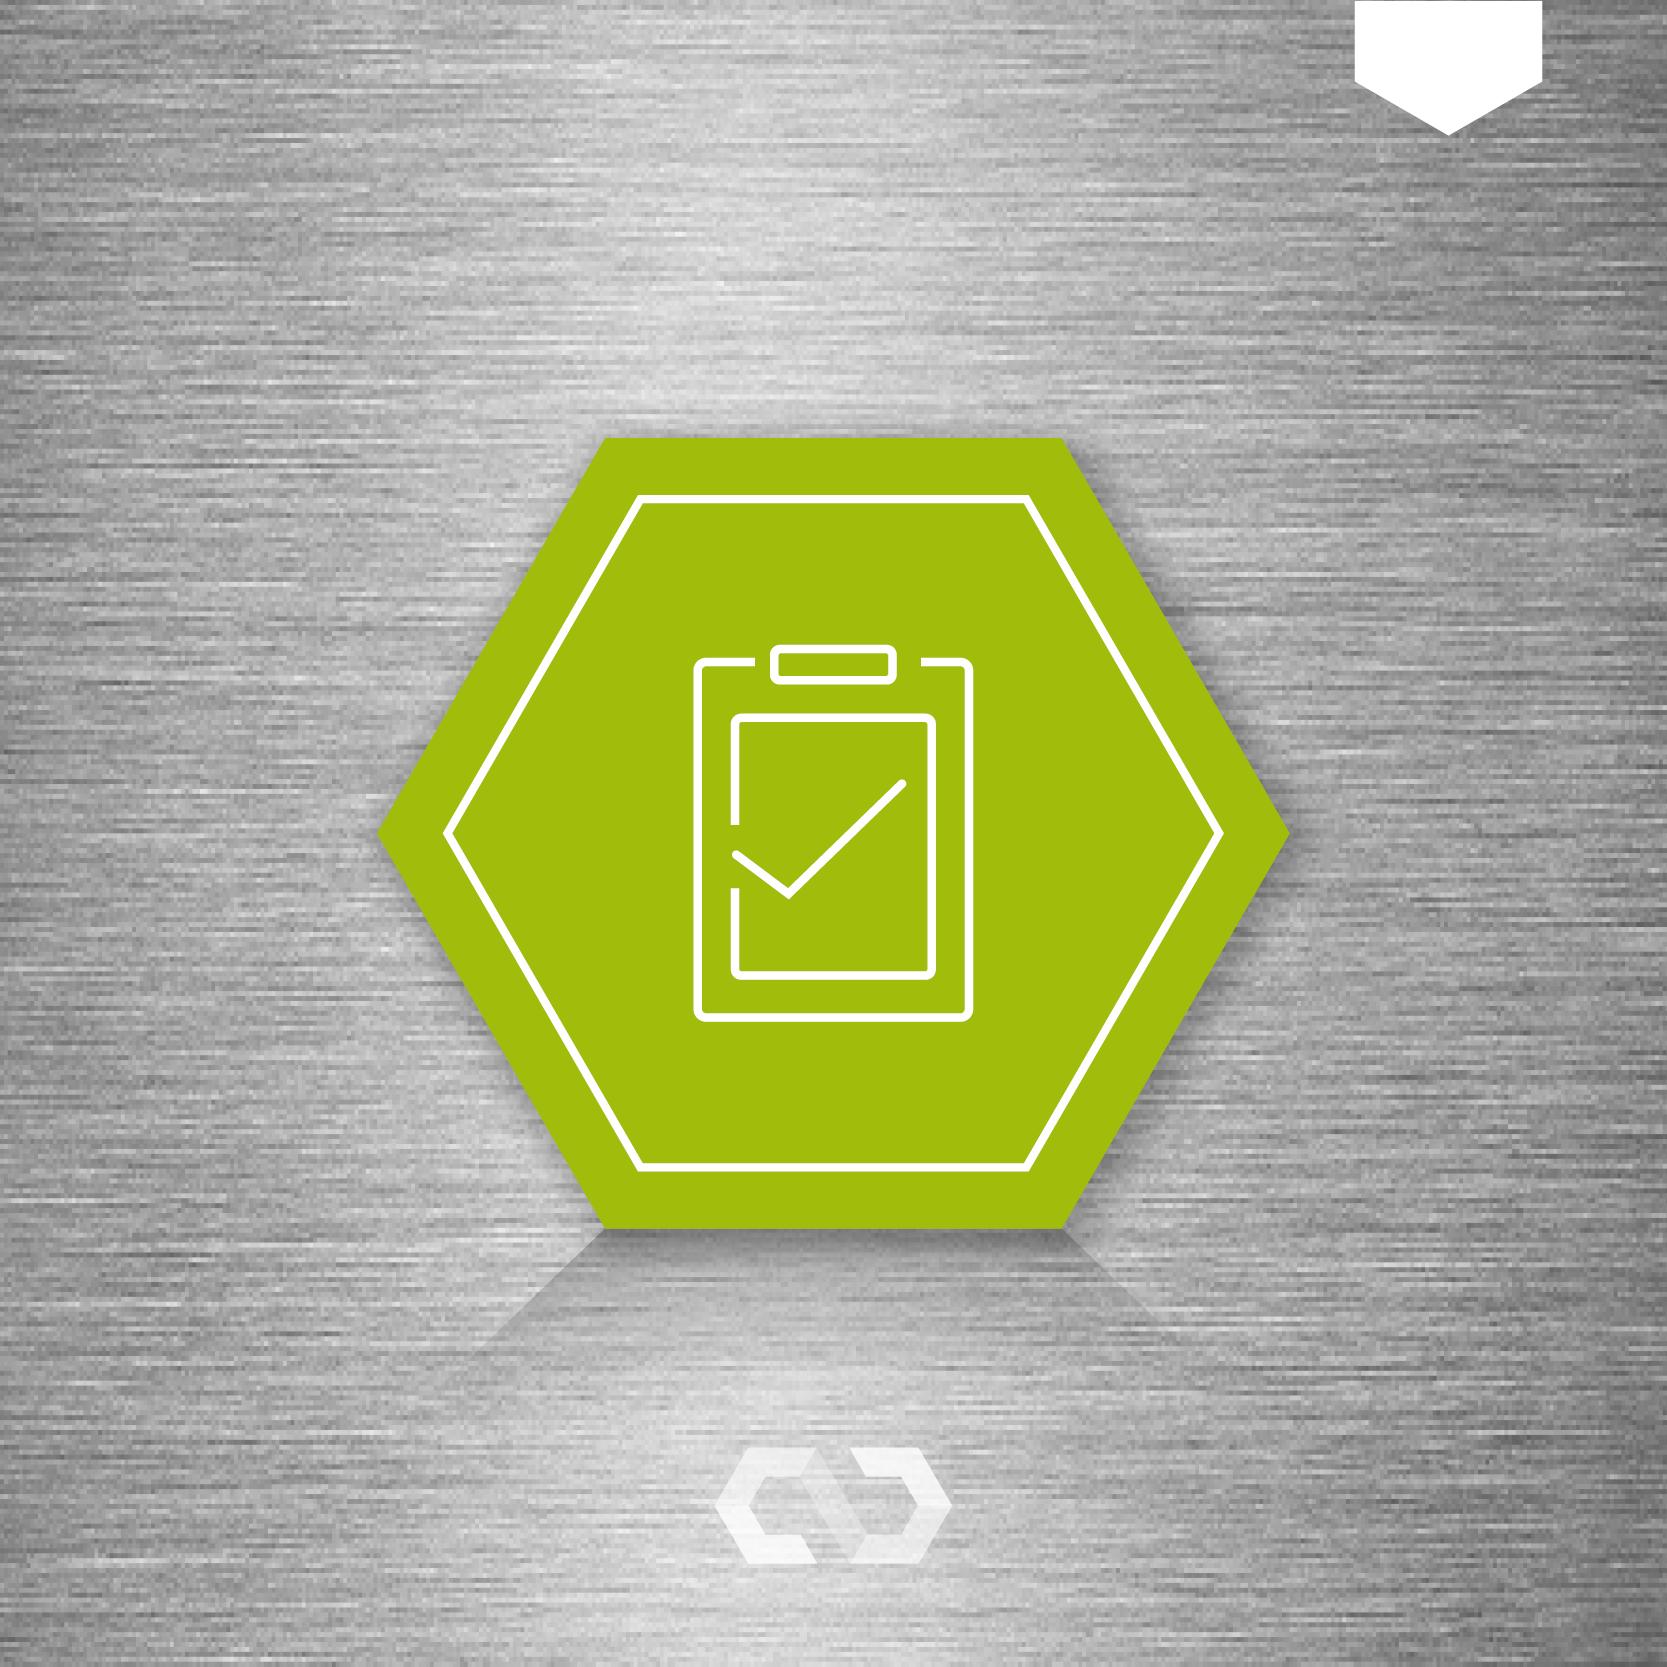 arivis-regulatory-inspection-management